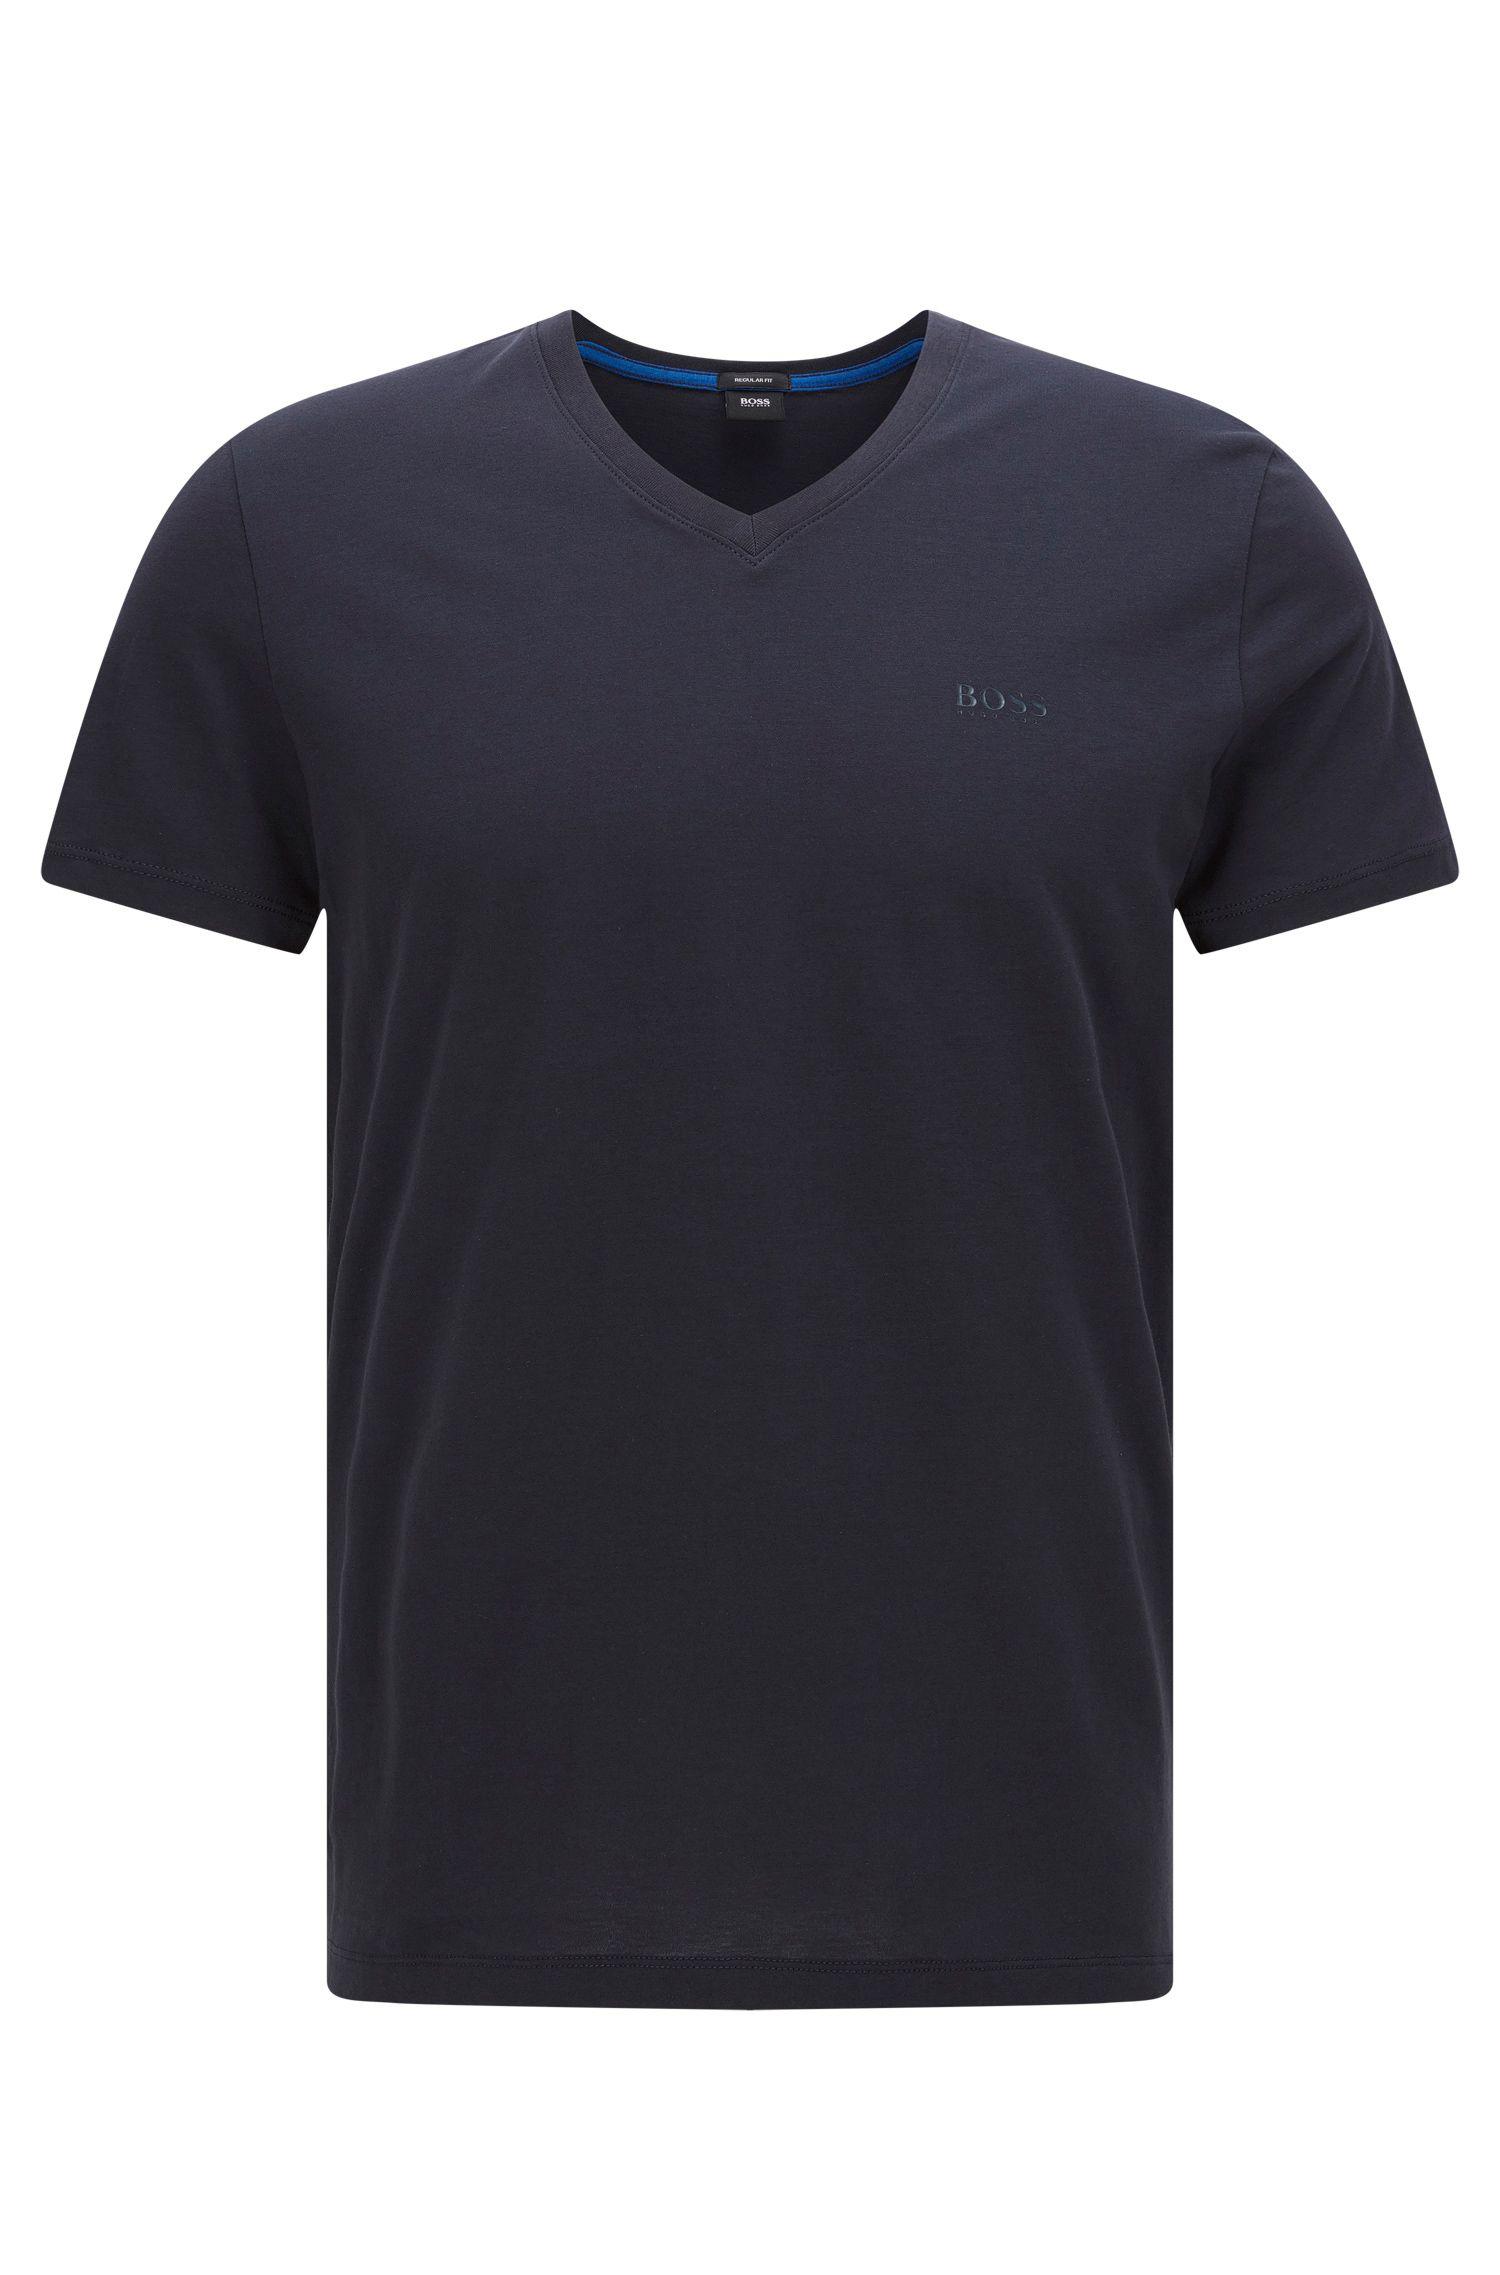 Regular-fit T-shirt in single jersey